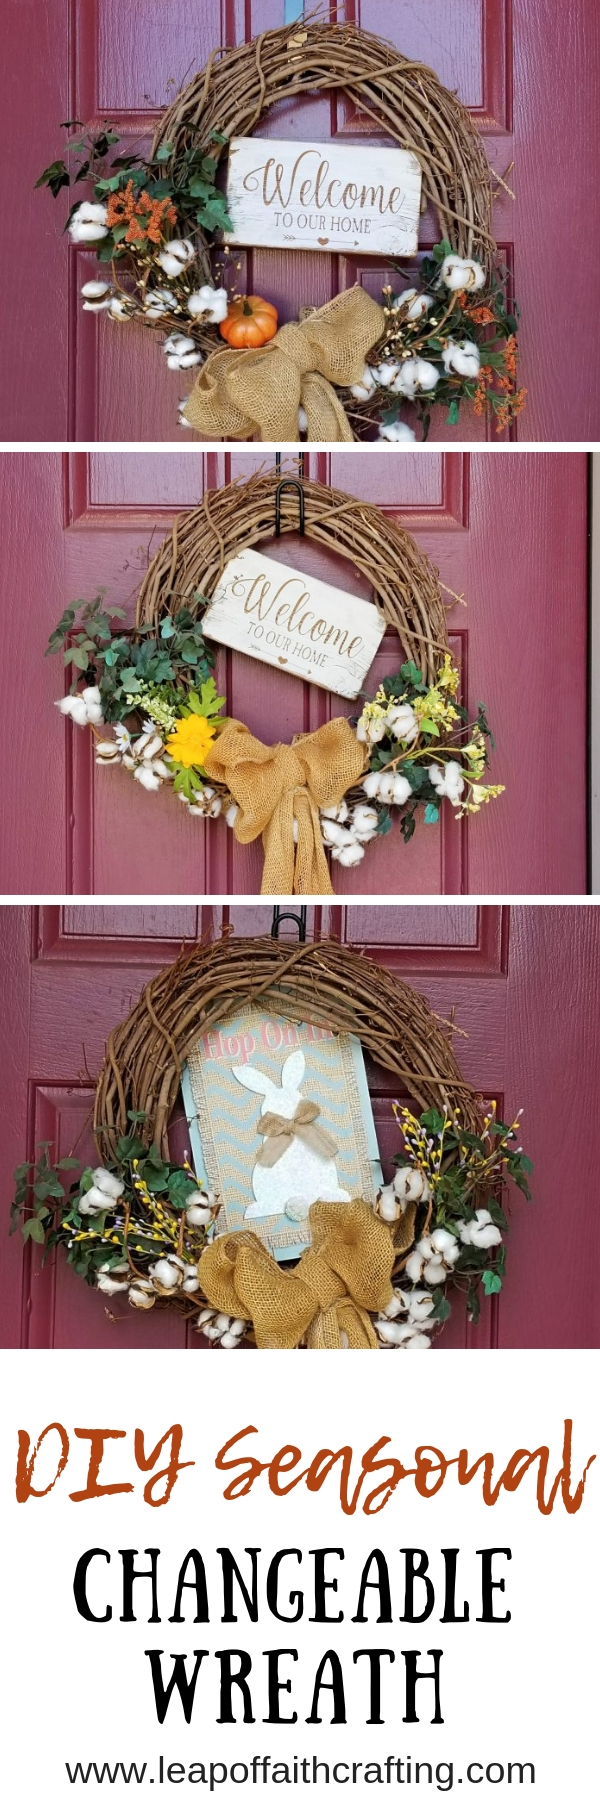 seasonal interchangeable wreaths